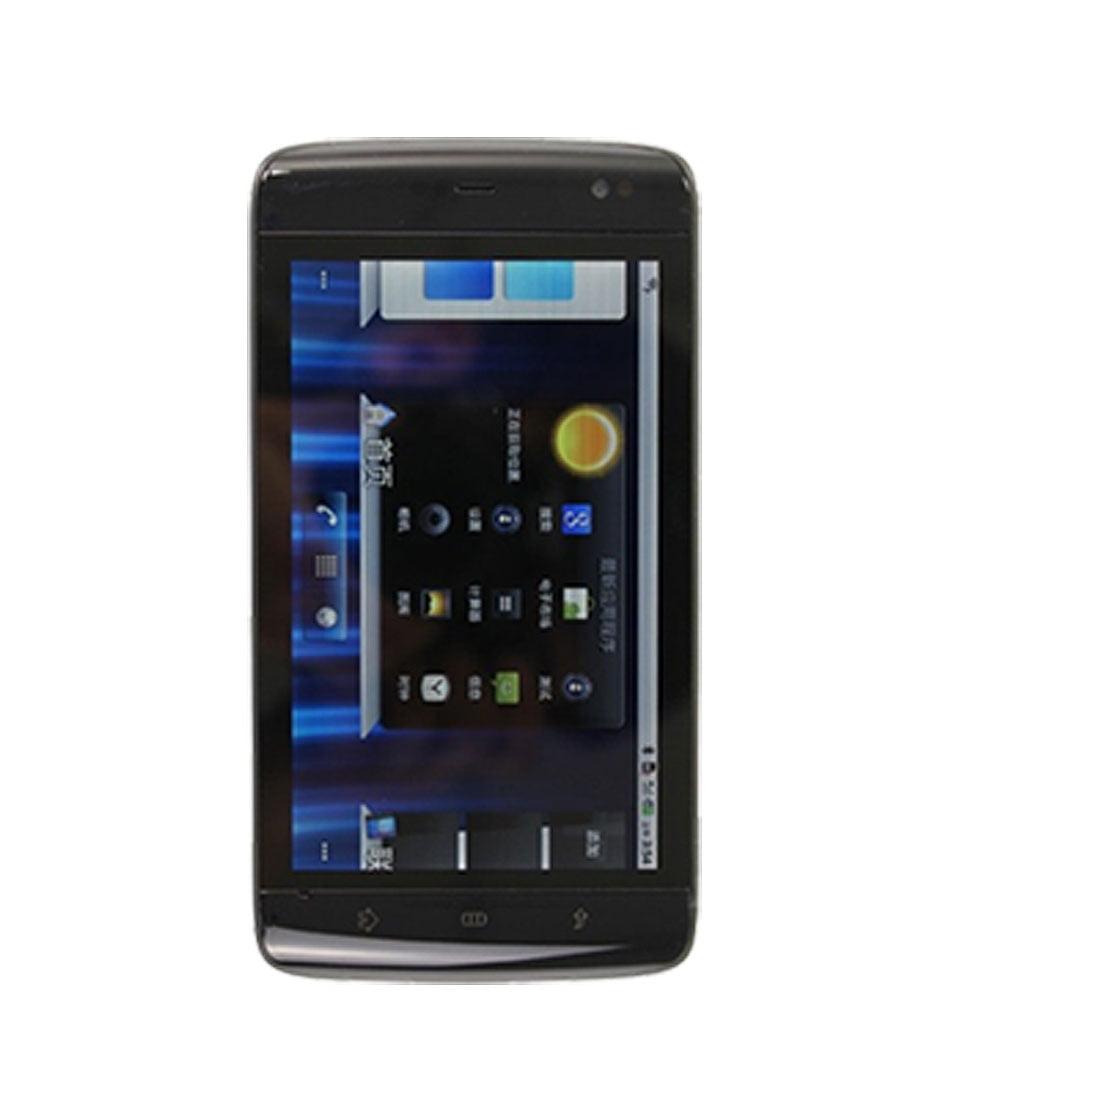 Unique Bargains 2 Pcs Transparent 5 Inch LCD Screen Guard Film for GPS Camera